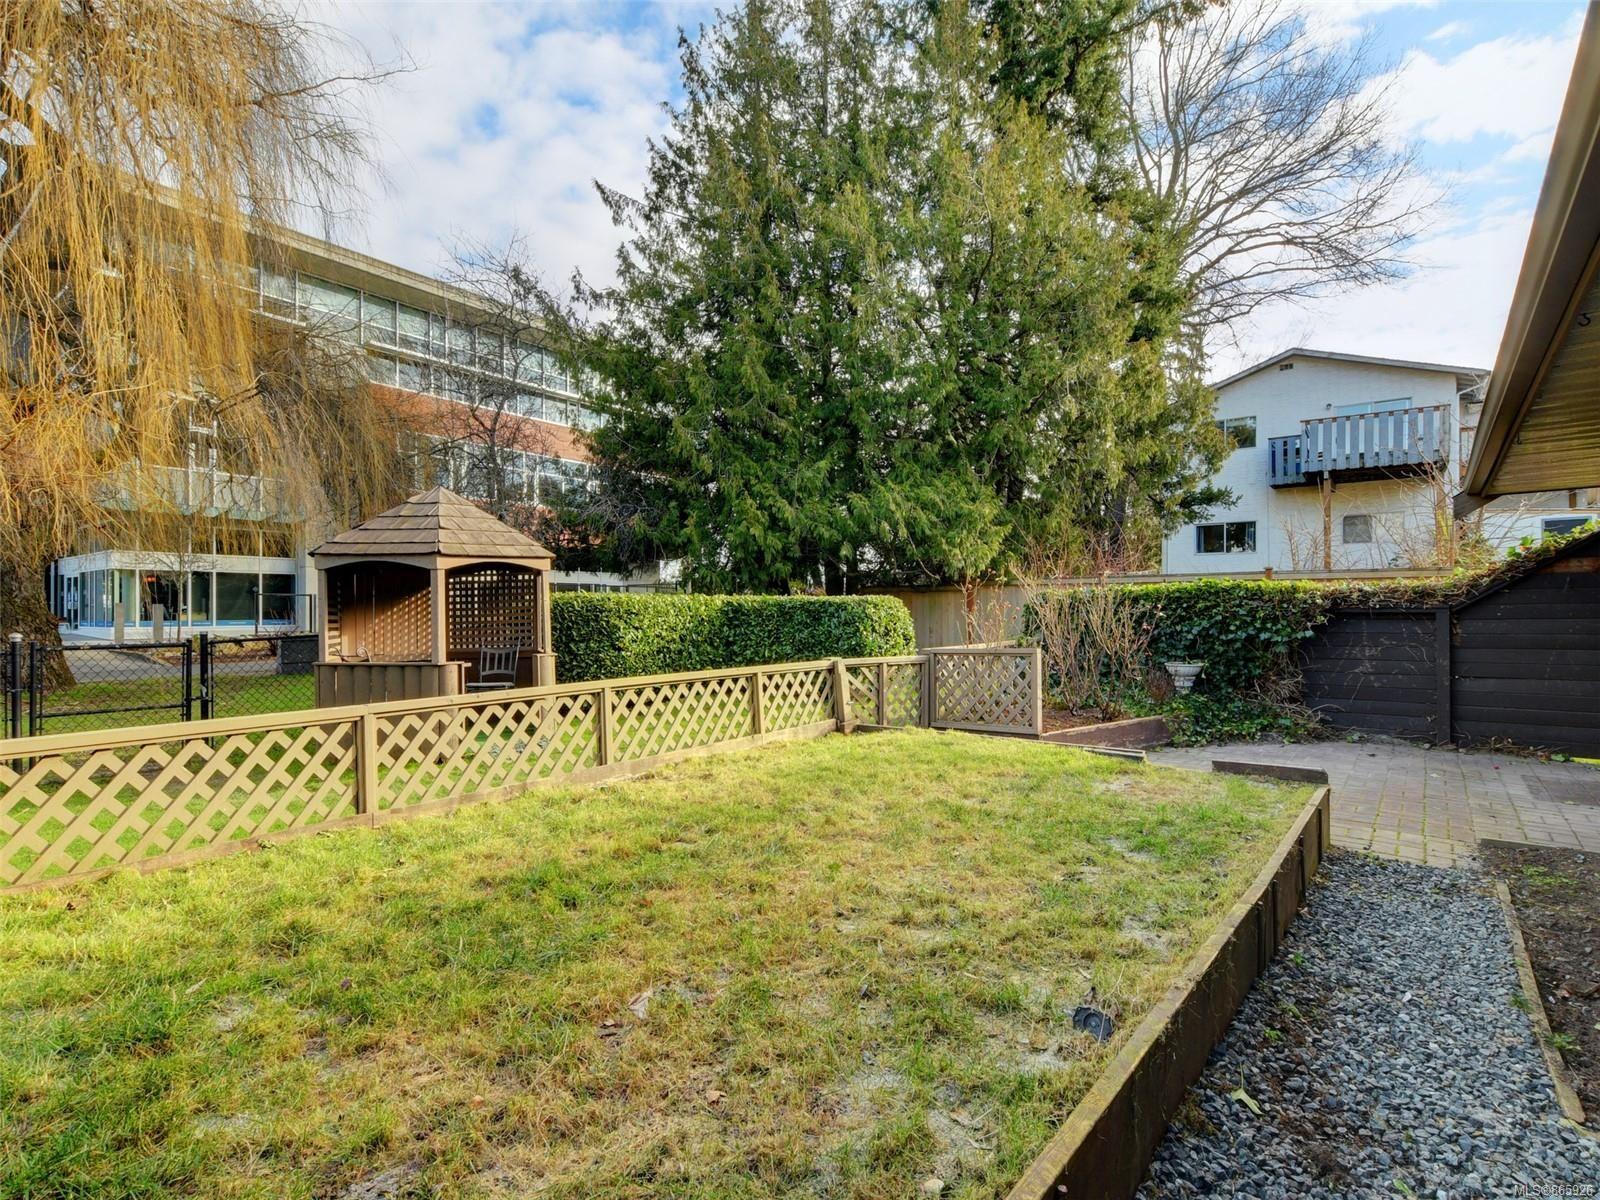 Photo 21: Photos: 8 4350 West Saanich Rd in : SW Royal Oak Row/Townhouse for sale (Saanich West)  : MLS®# 865926